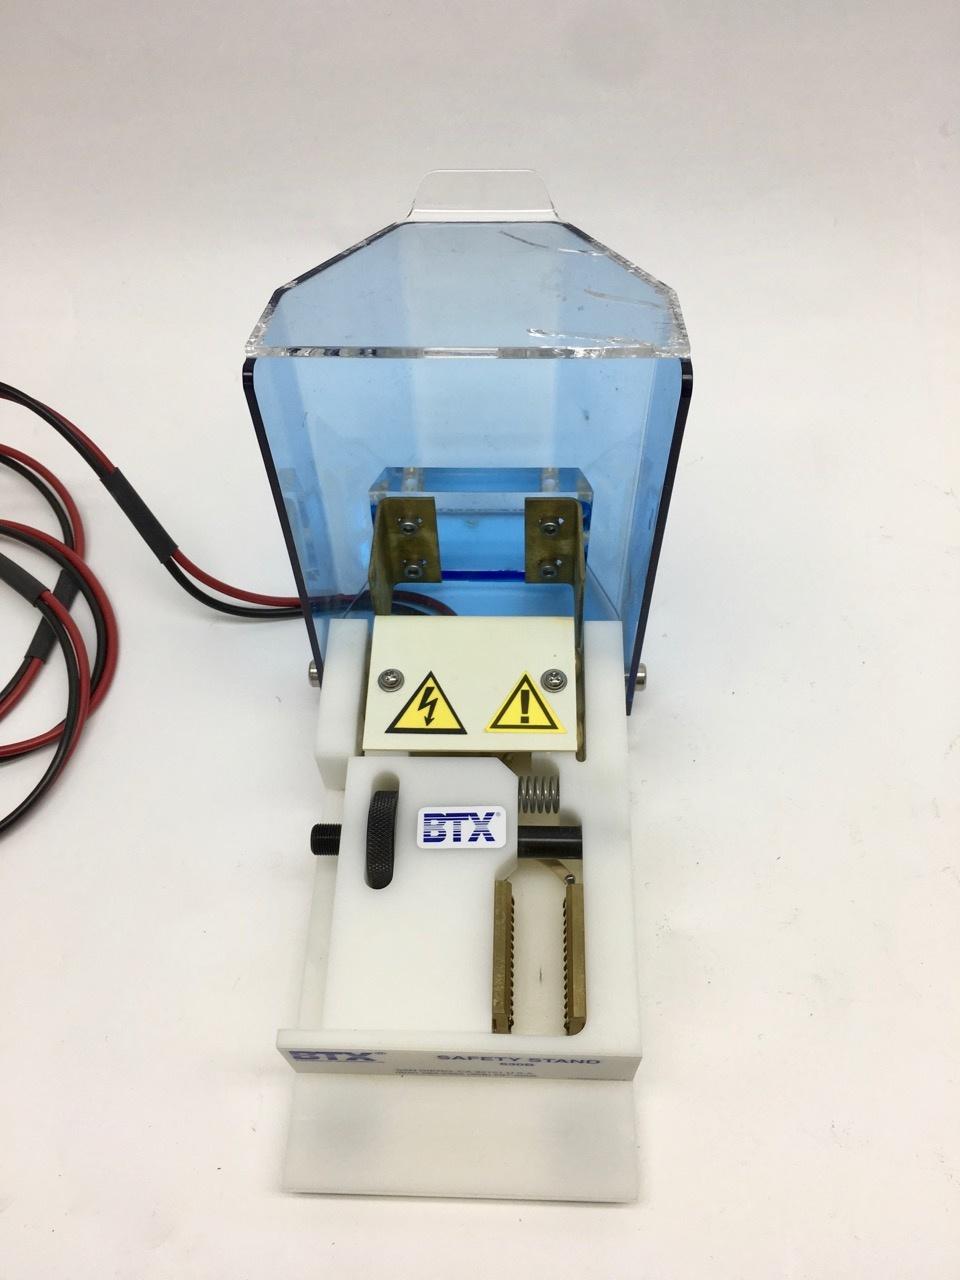 BTX BTX ECM 830 Square Wave Electroporator with BTX Safety Stand 630B